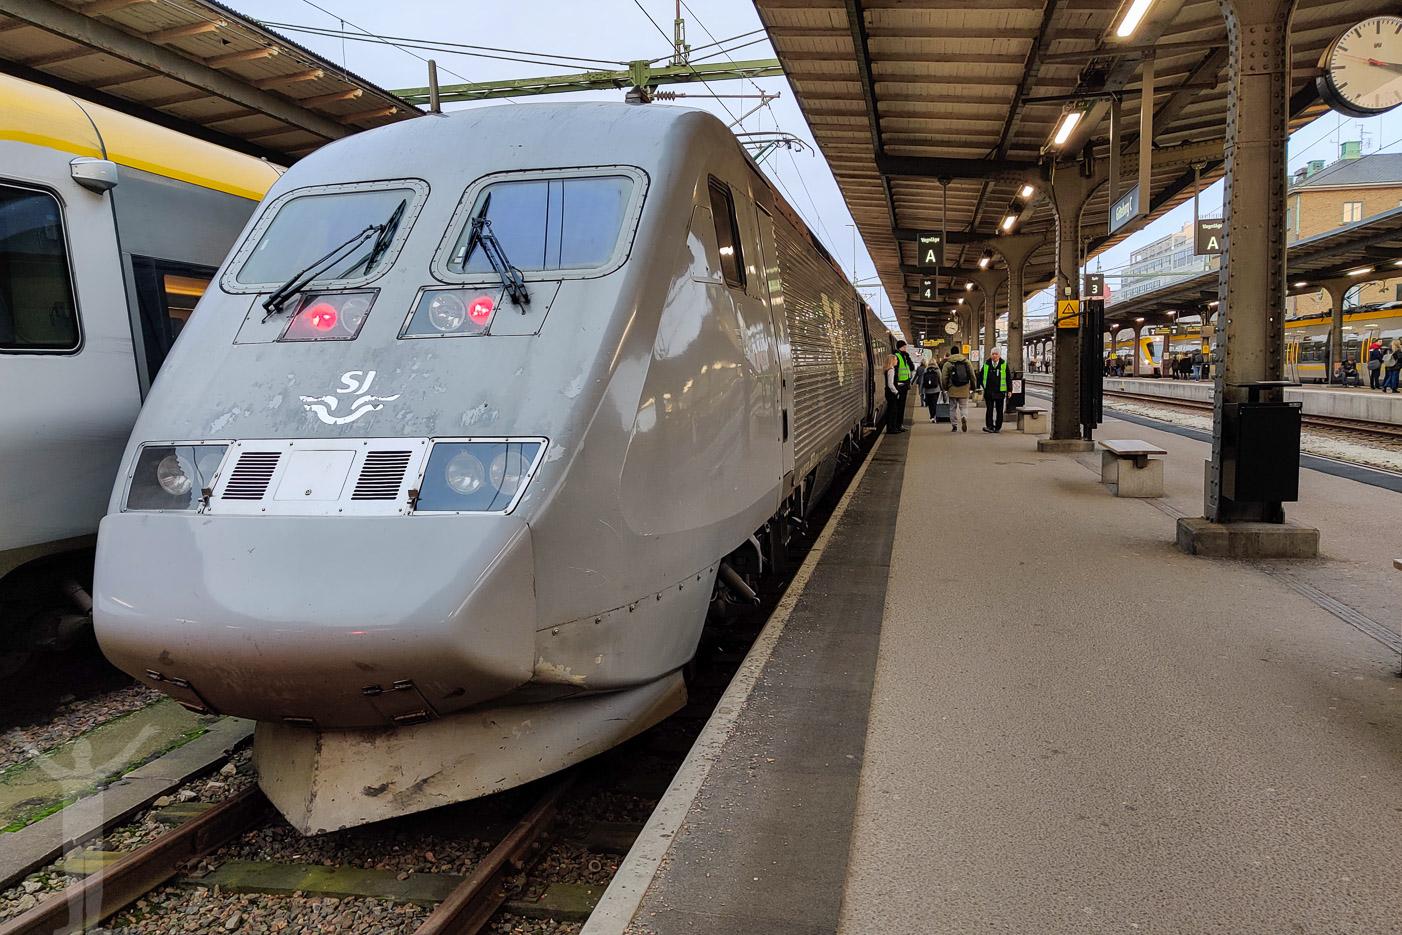 SJ X2000 i Göteborg